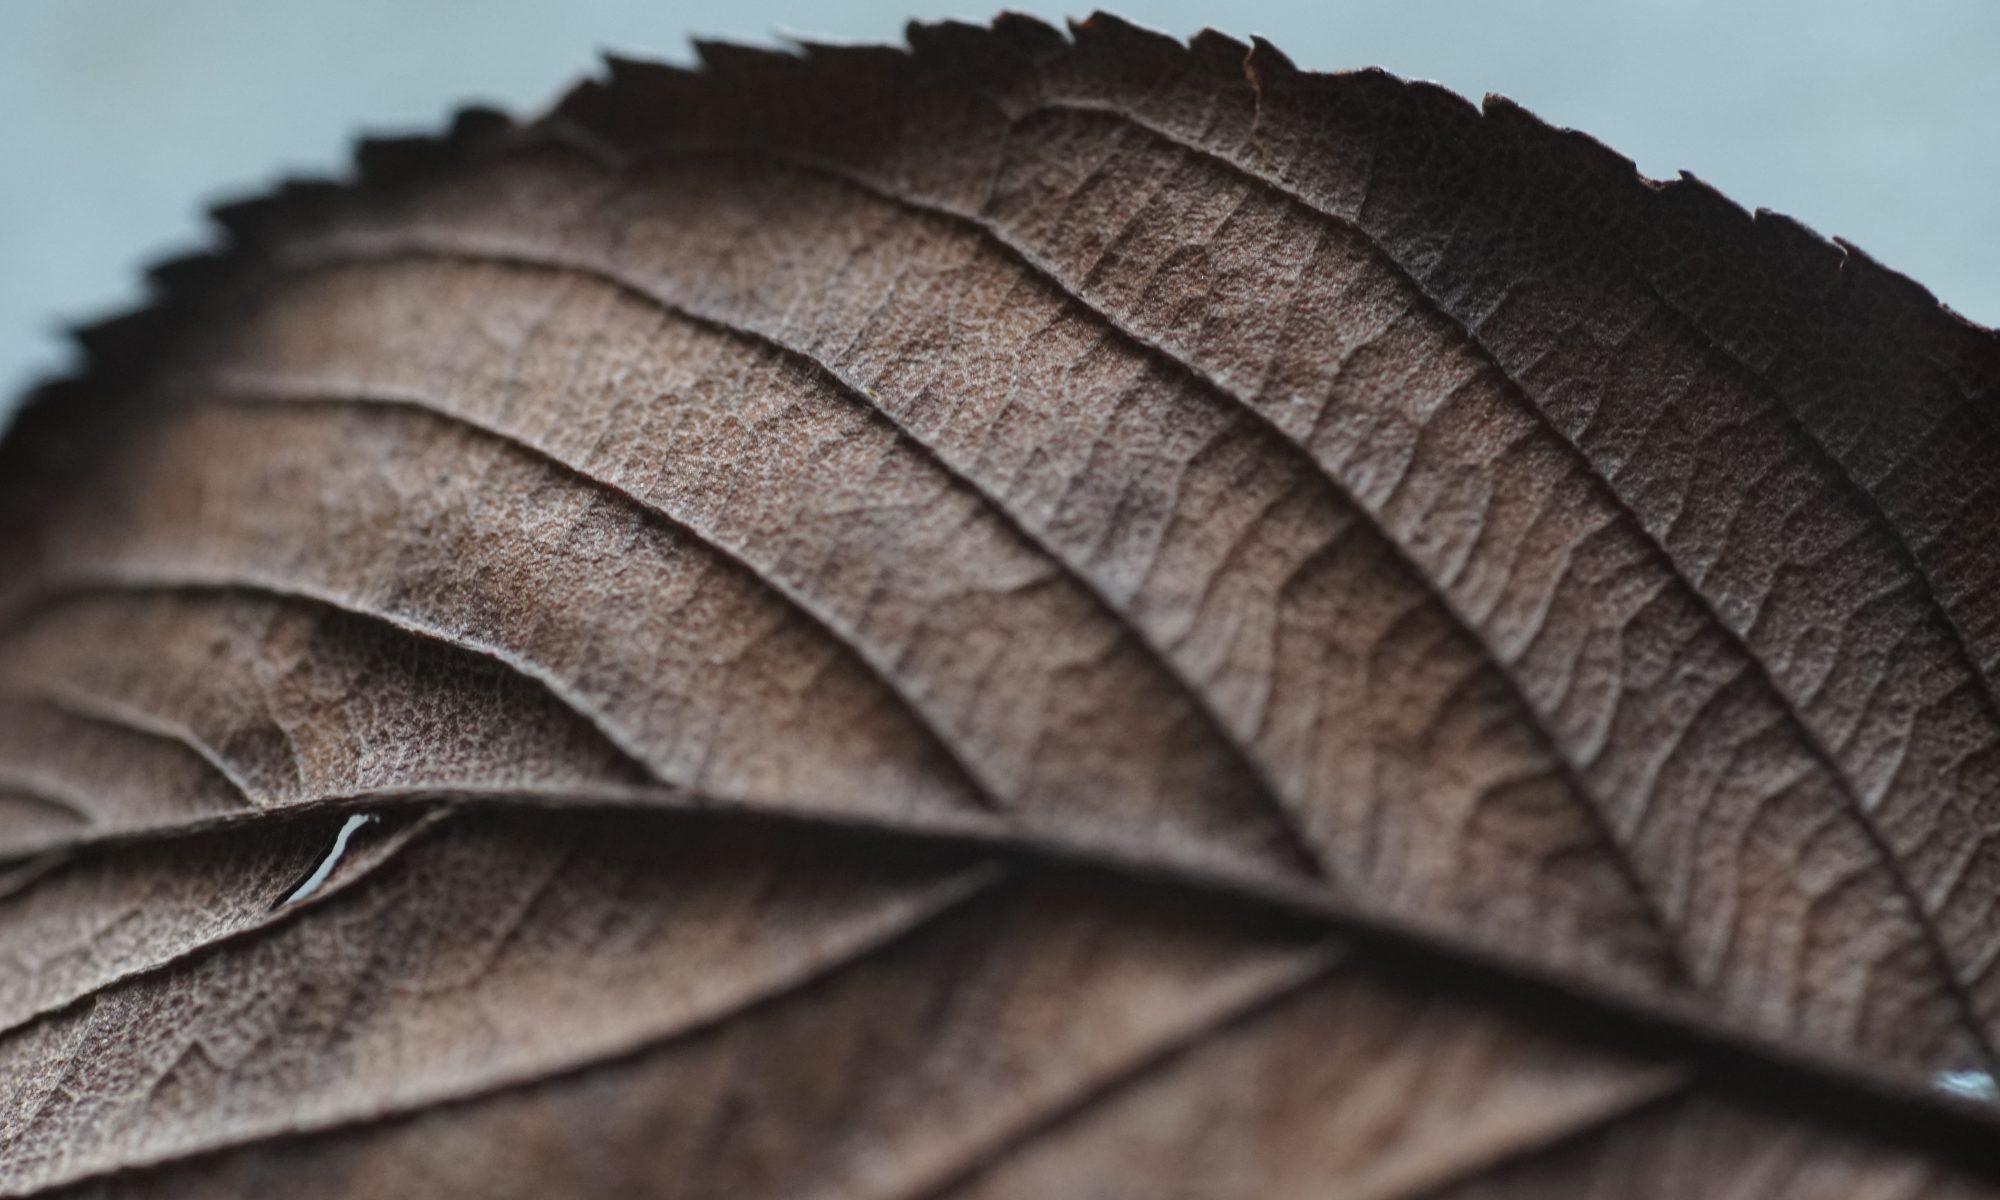 Leaf by Hiroyuki Igarashi via Unsplash